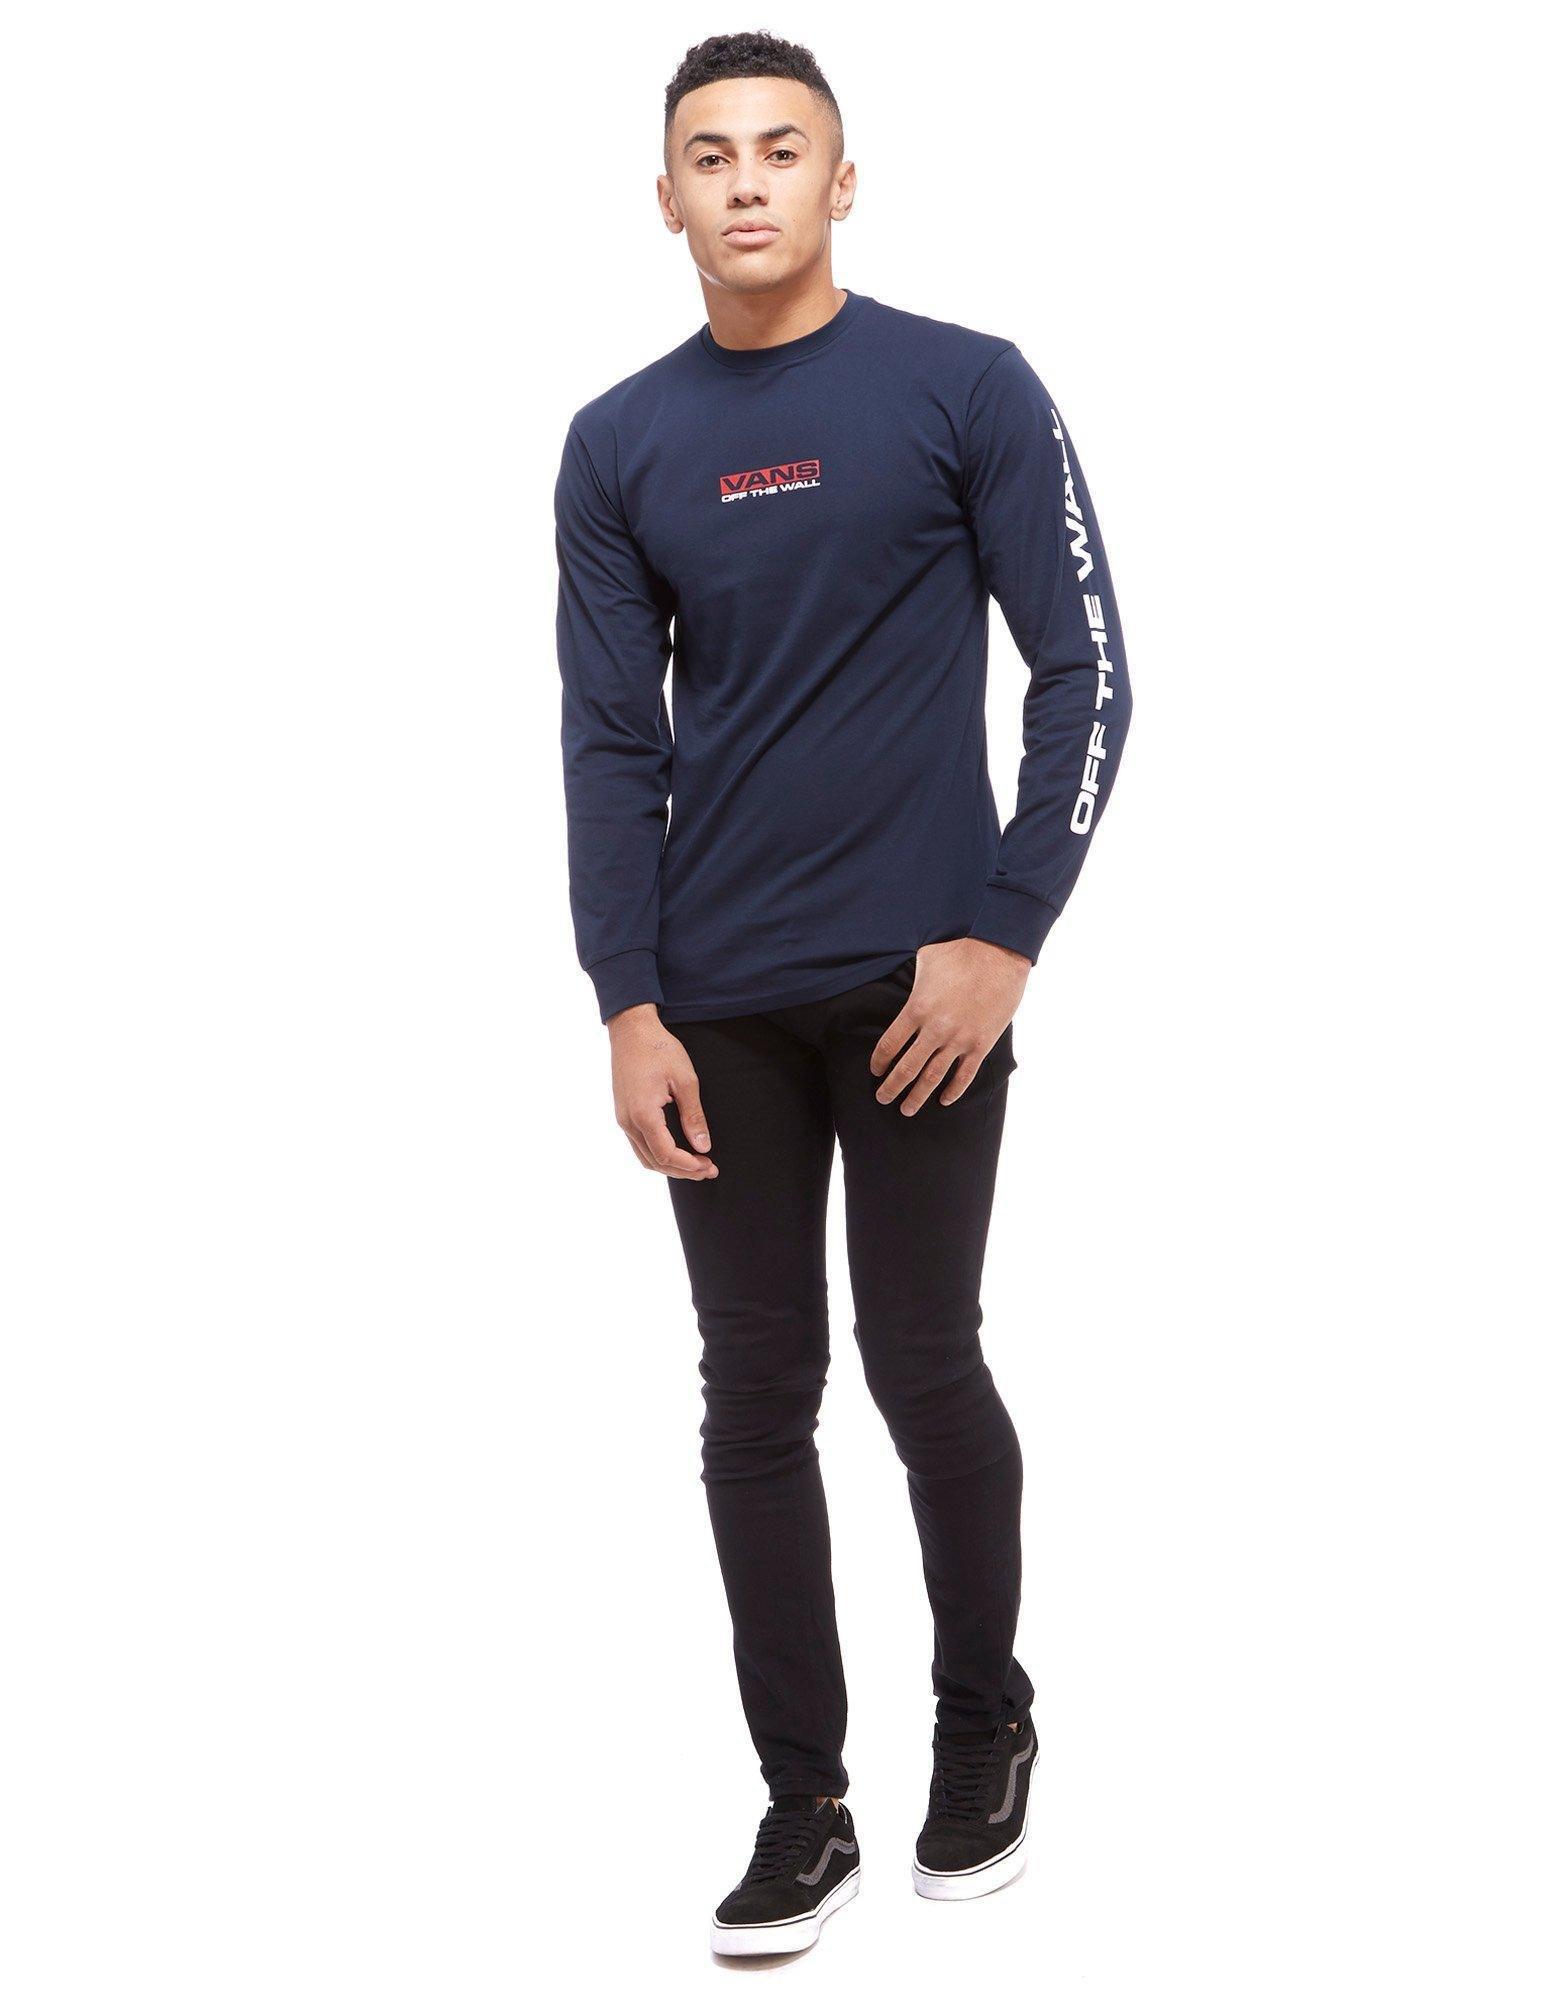 ca2e7802b2 Vans Blue Side Waze Long Sleeve T-shirt for men